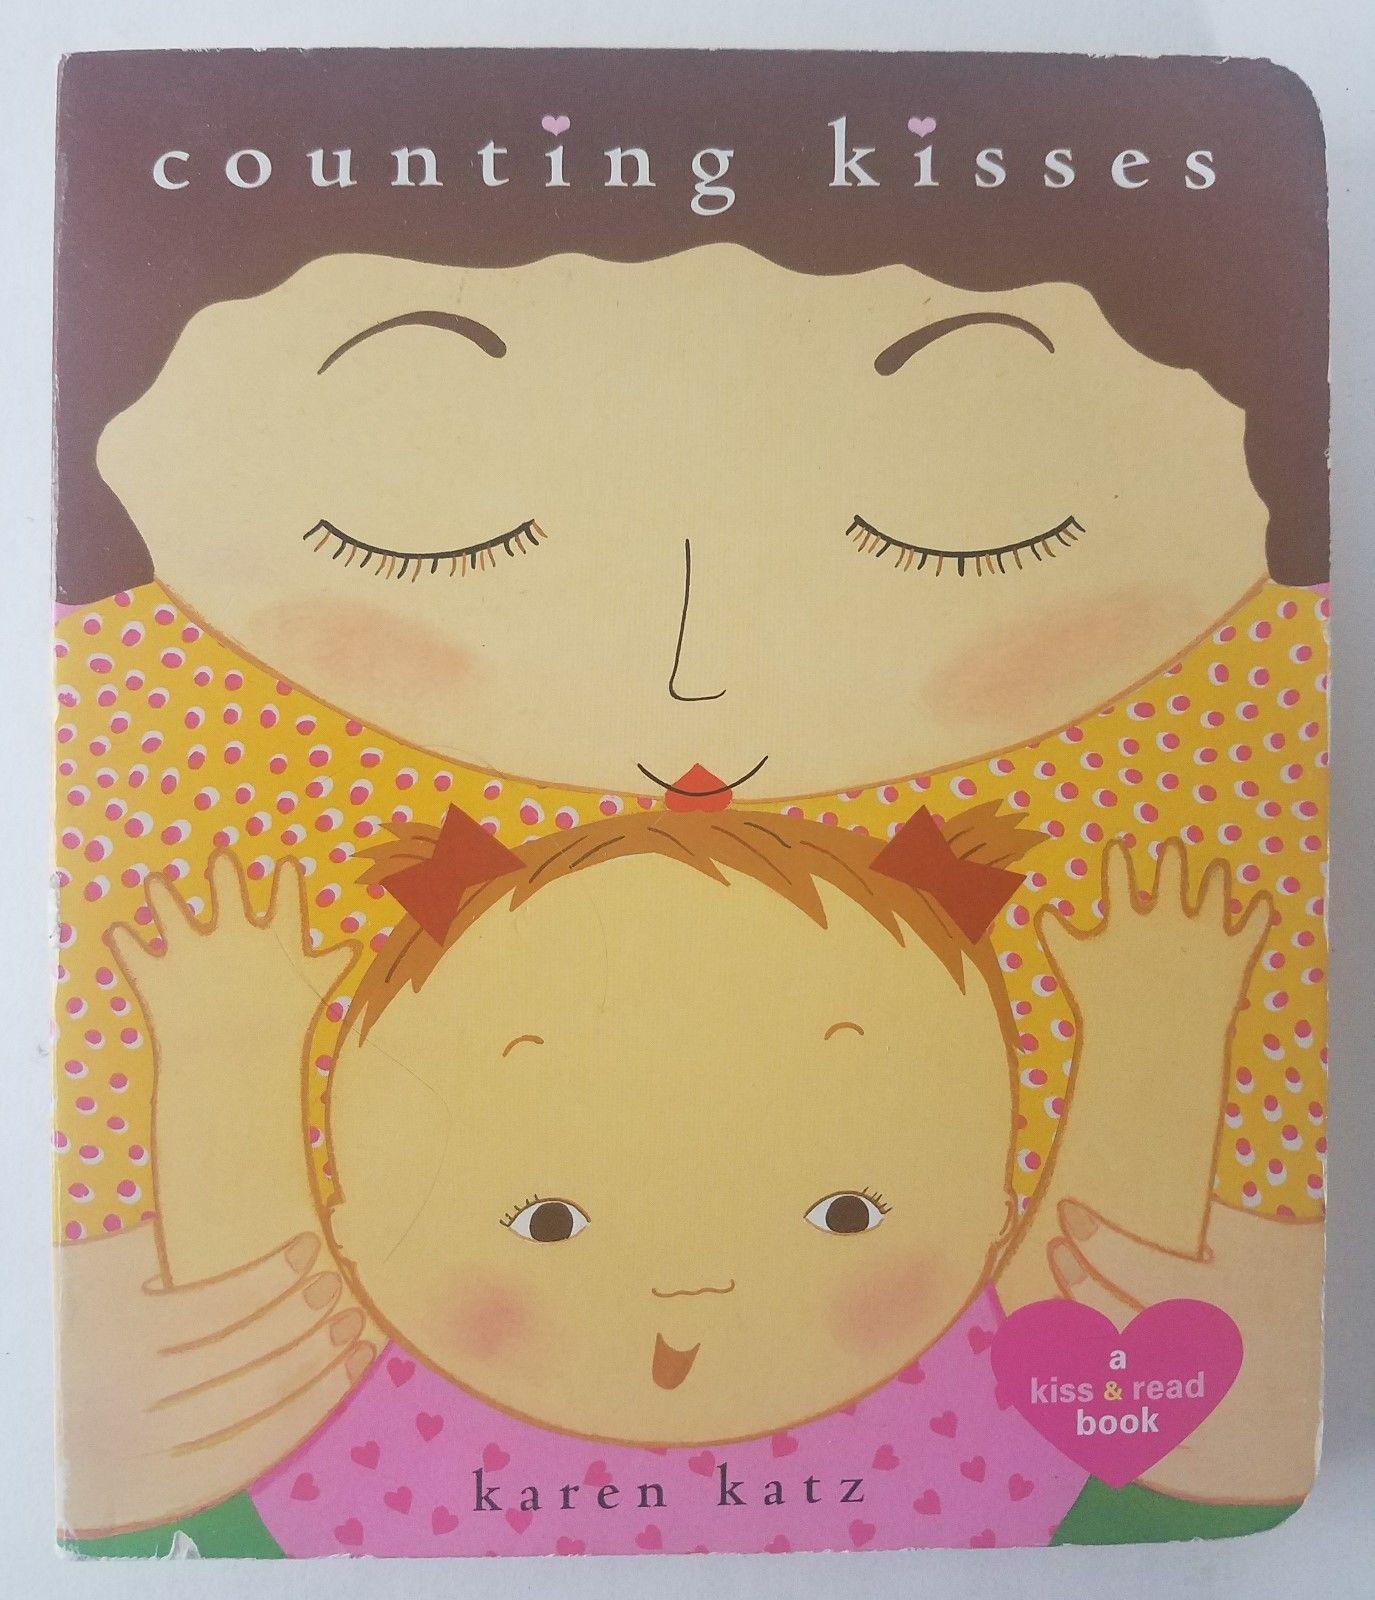 Baby Toddler Day Care Learning Board Books Lot of 5 Karen Katz